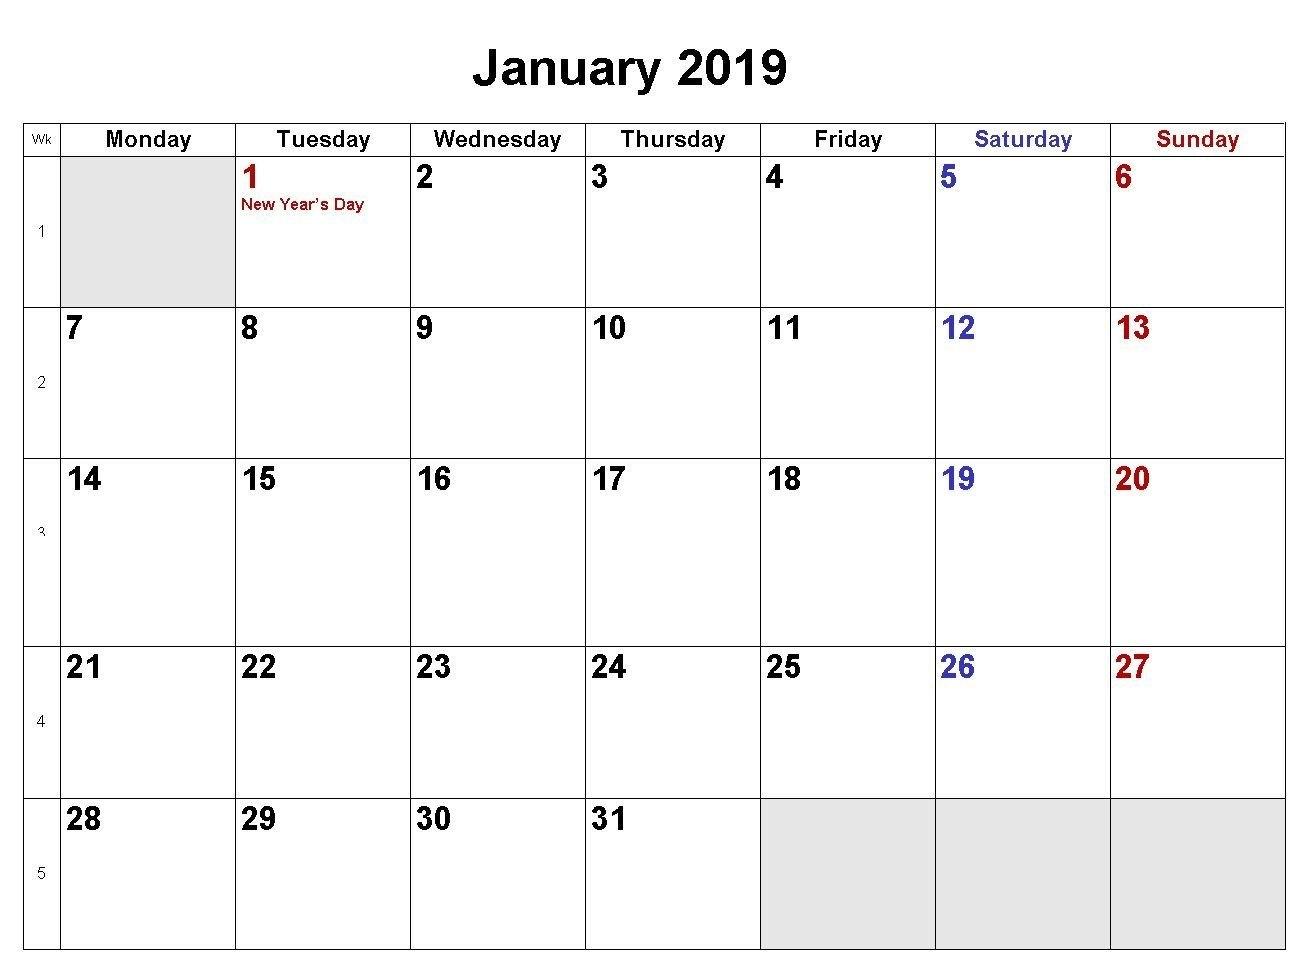 January 2019 Calendar Word Doc   Template Of January 2019 Blank Calendar 2019 Doc